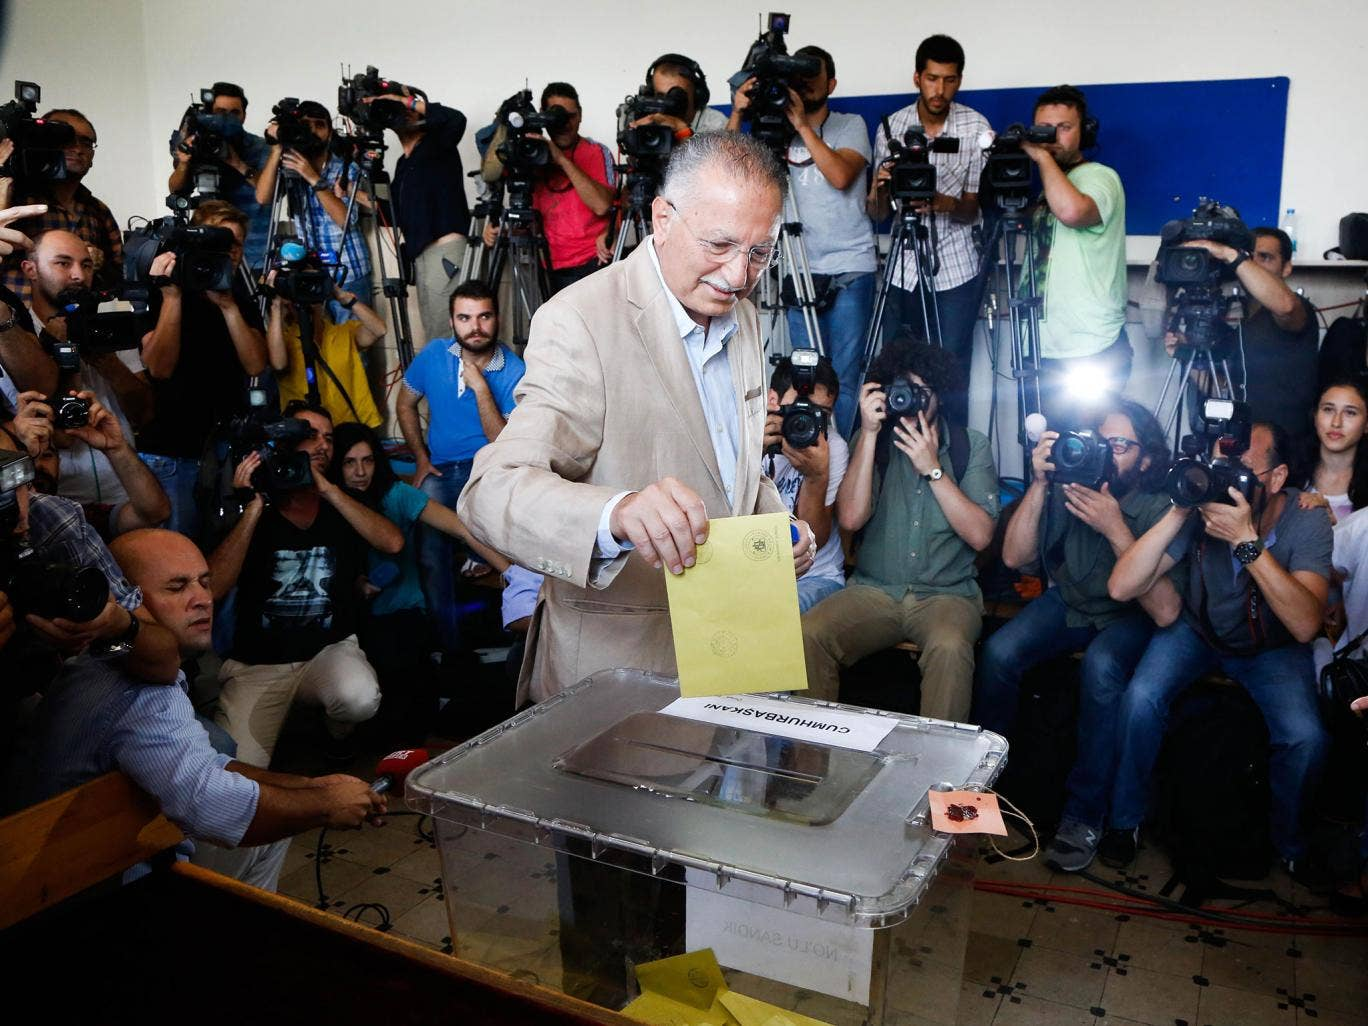 Recep Tayyip Erdogan casts his vote